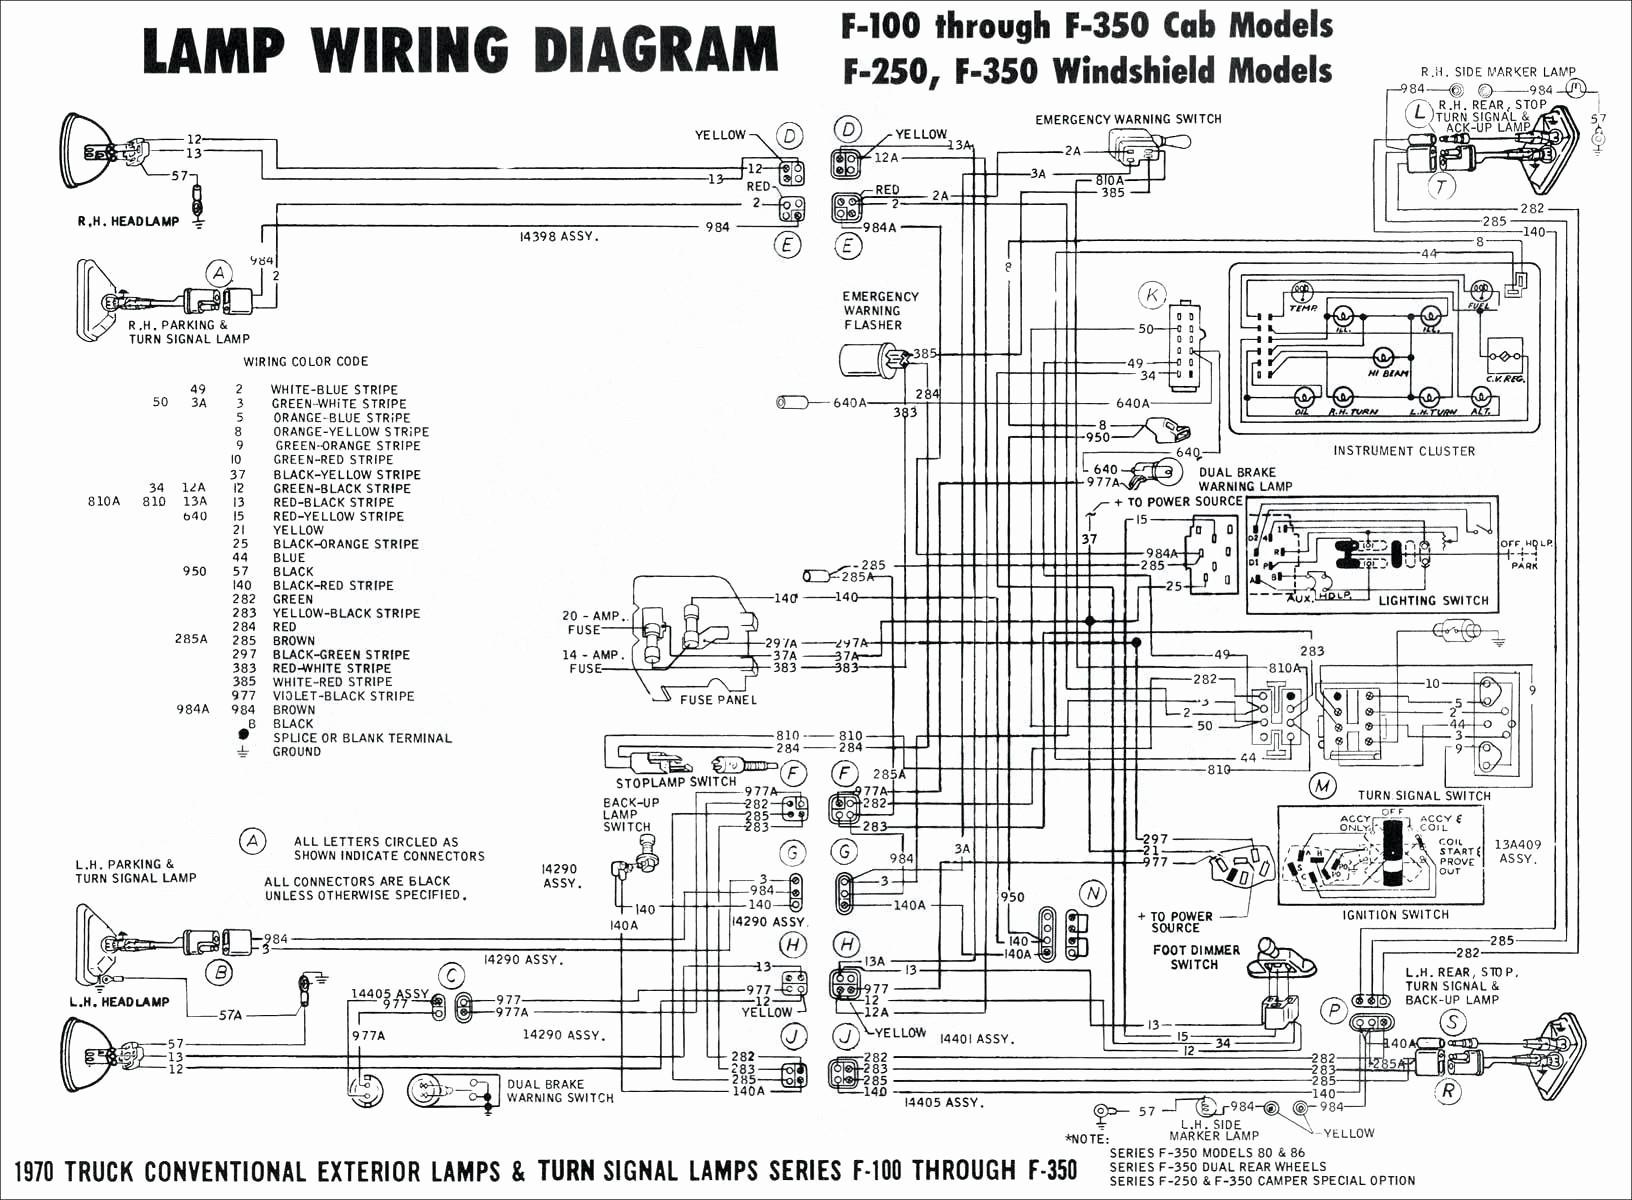 Bmw Wds Online Free Wrg 7045] Bmw Wiring Diagram E38 Of Bmw Wds Online Free